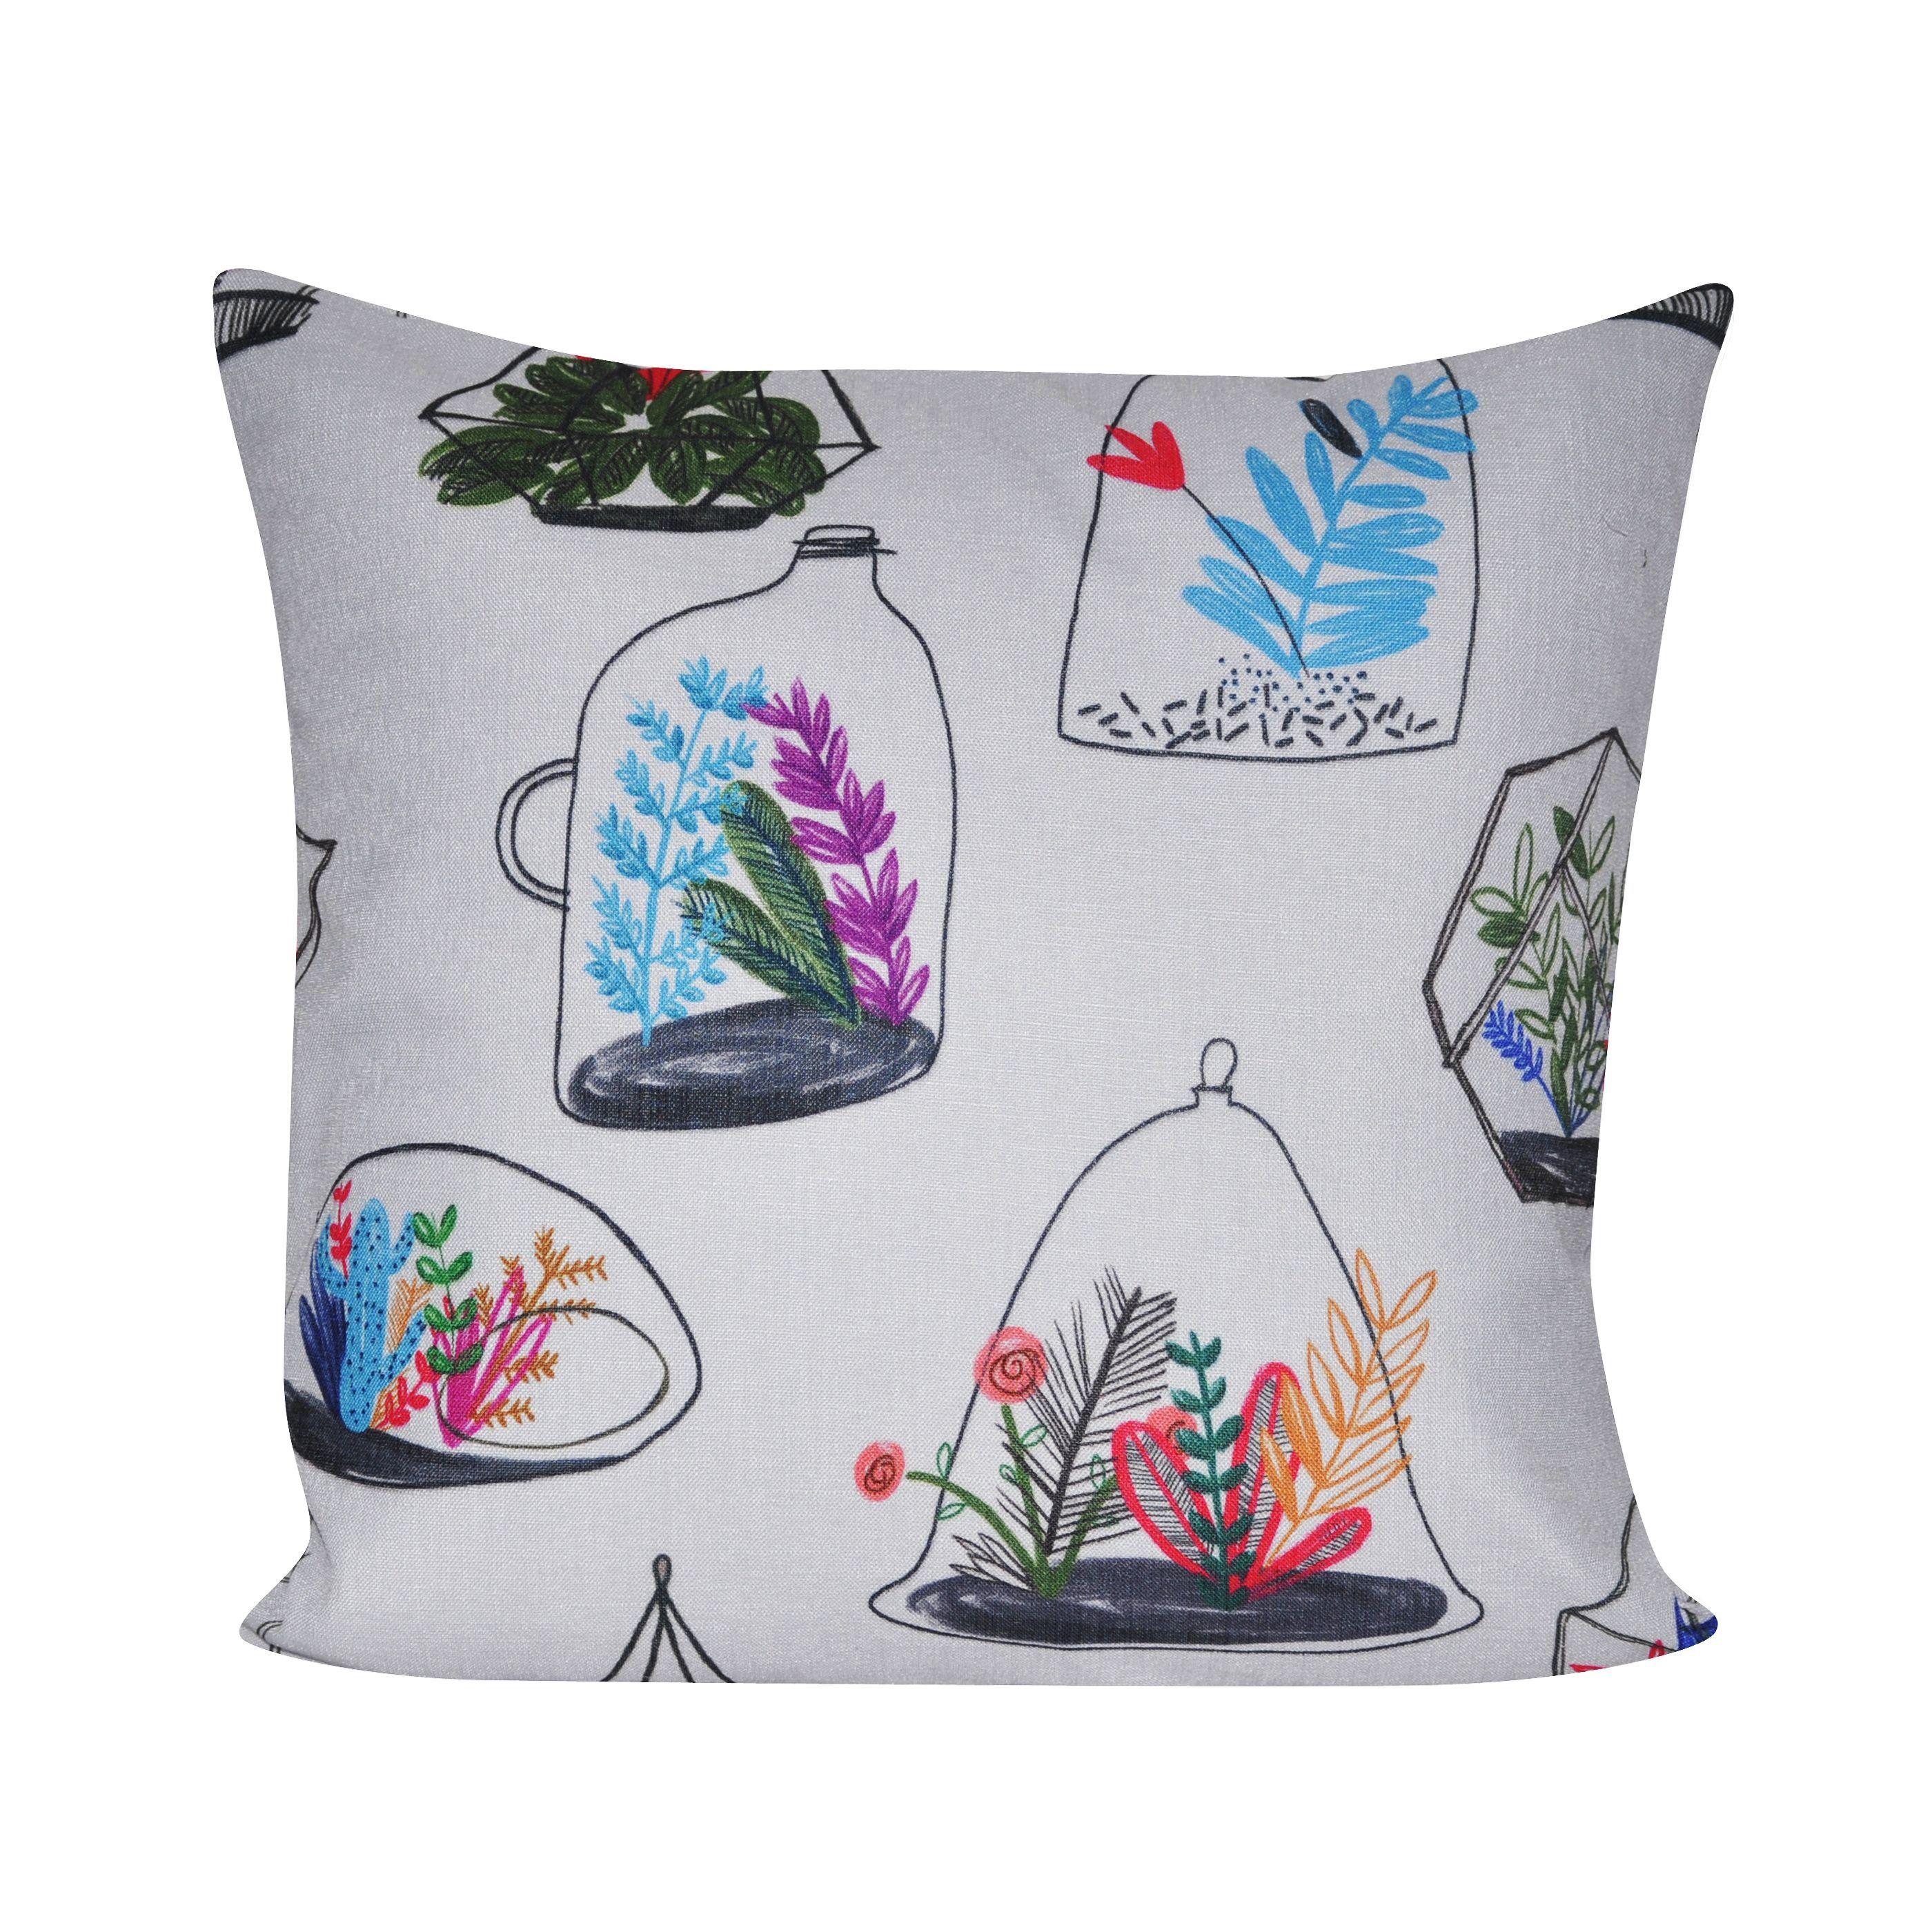 Loom and mill x inch terrarium decorative pillow multi blue